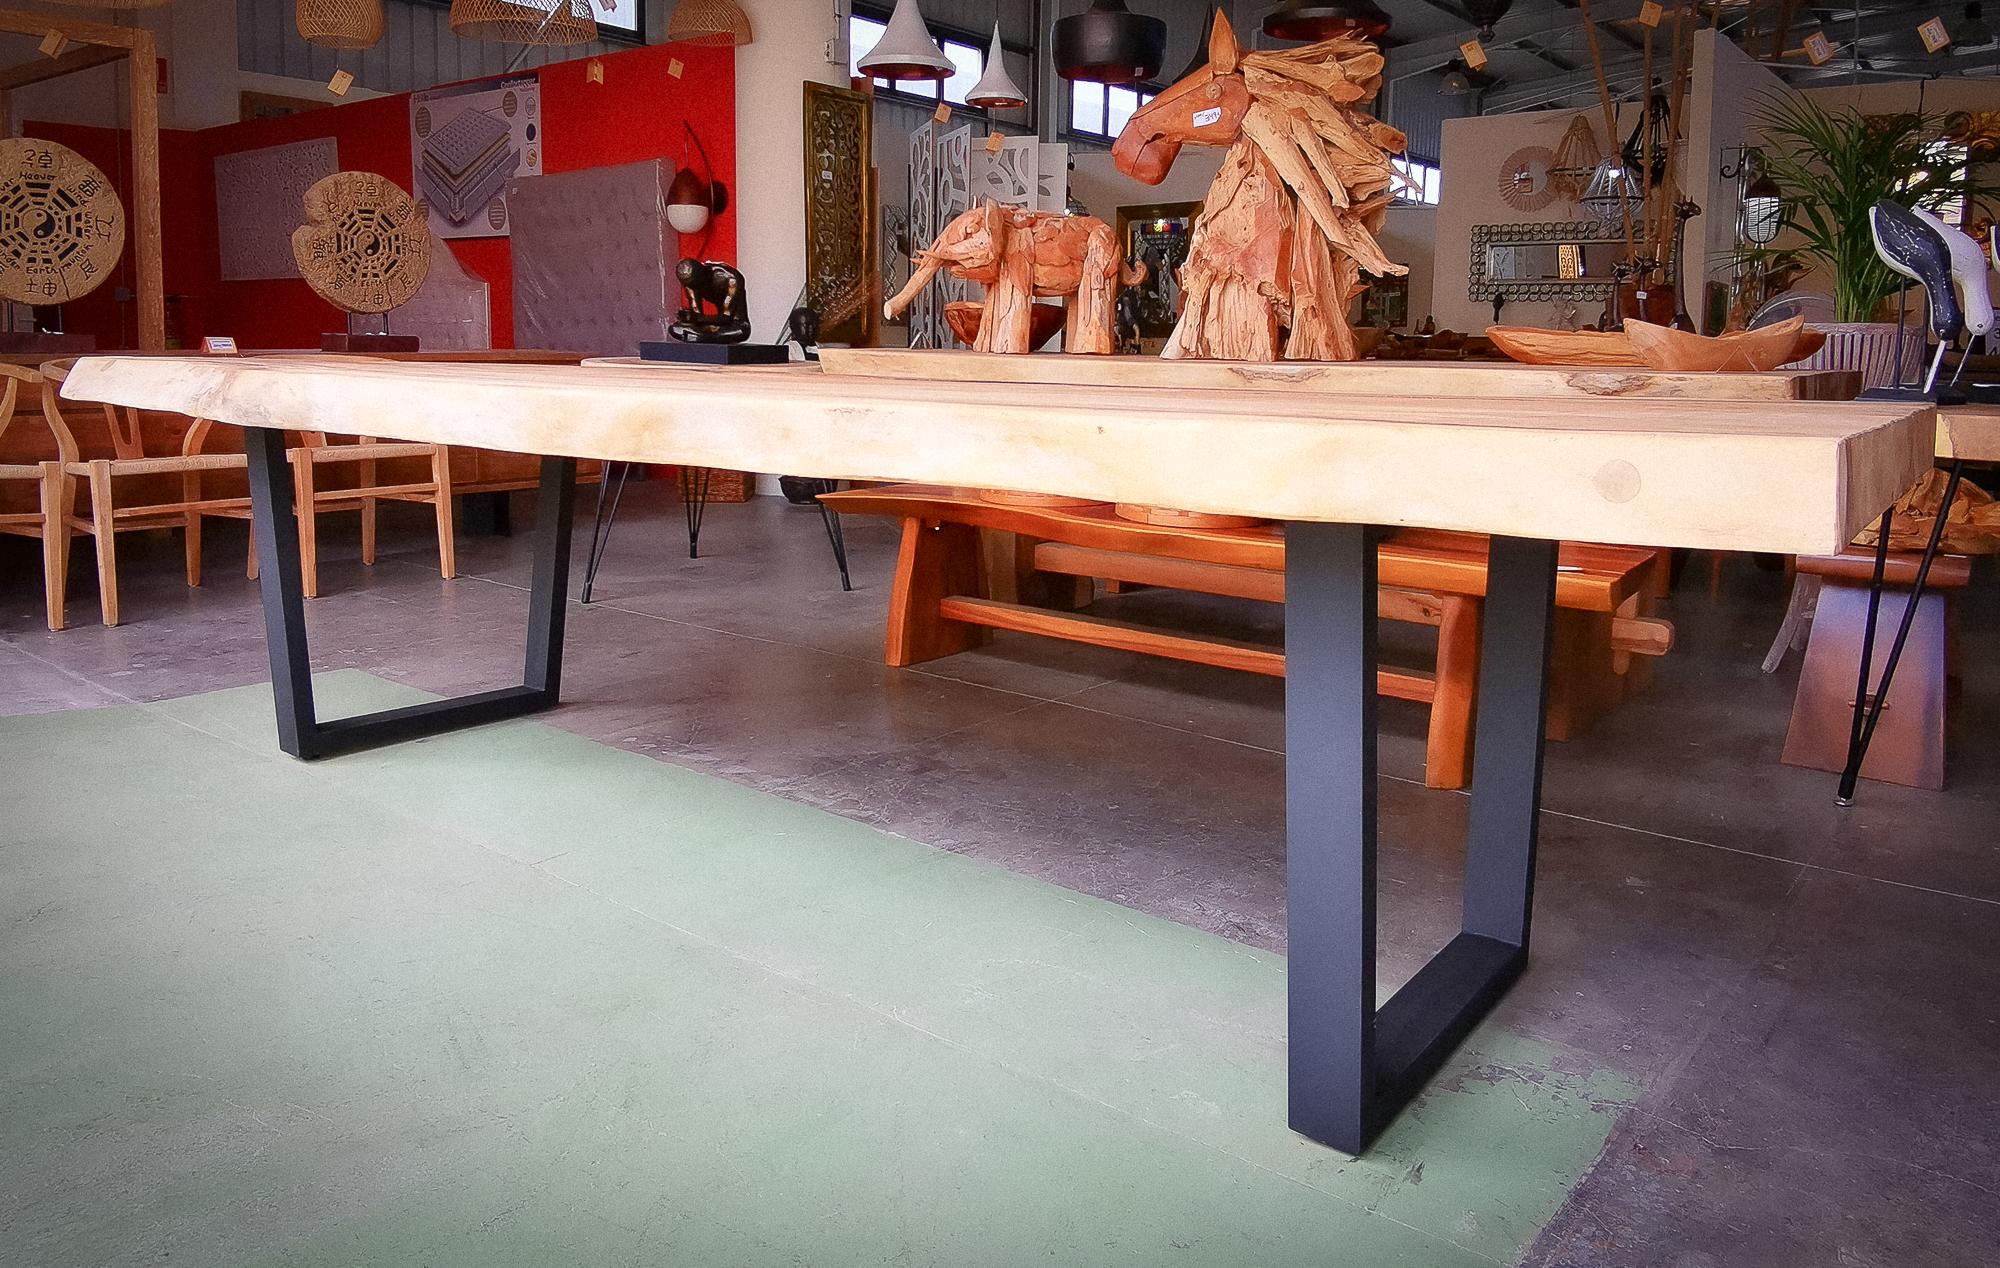 Mesas de suar de 3 metros con pata U